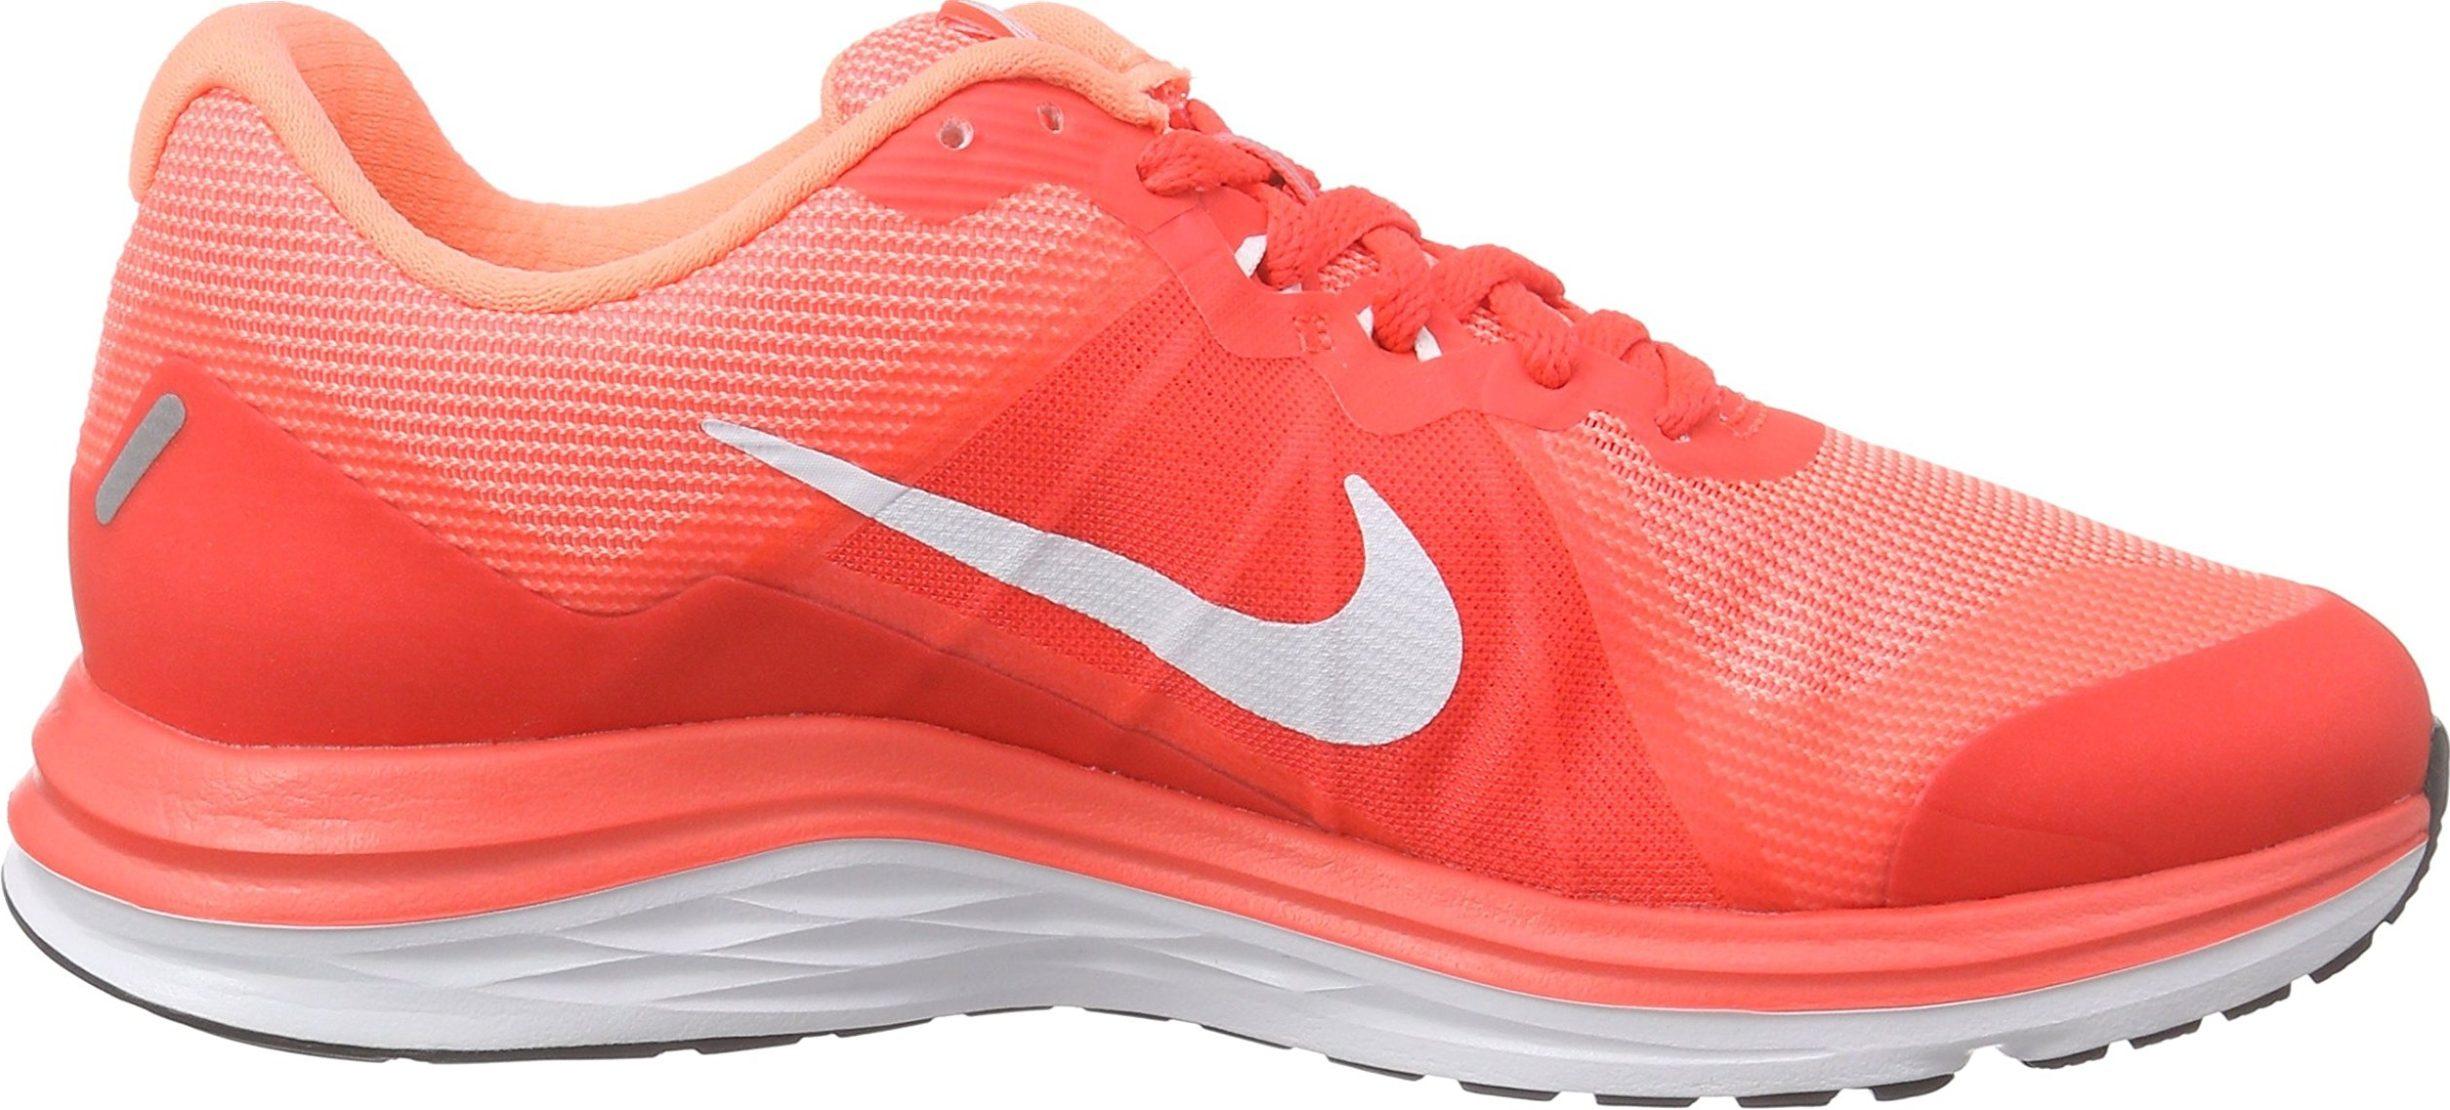 Solo haz legumbres micrófono  9 Reasons to/NOT to Buy Nike Dual Fusion X 2 (Jan 2021) | RunRepeat